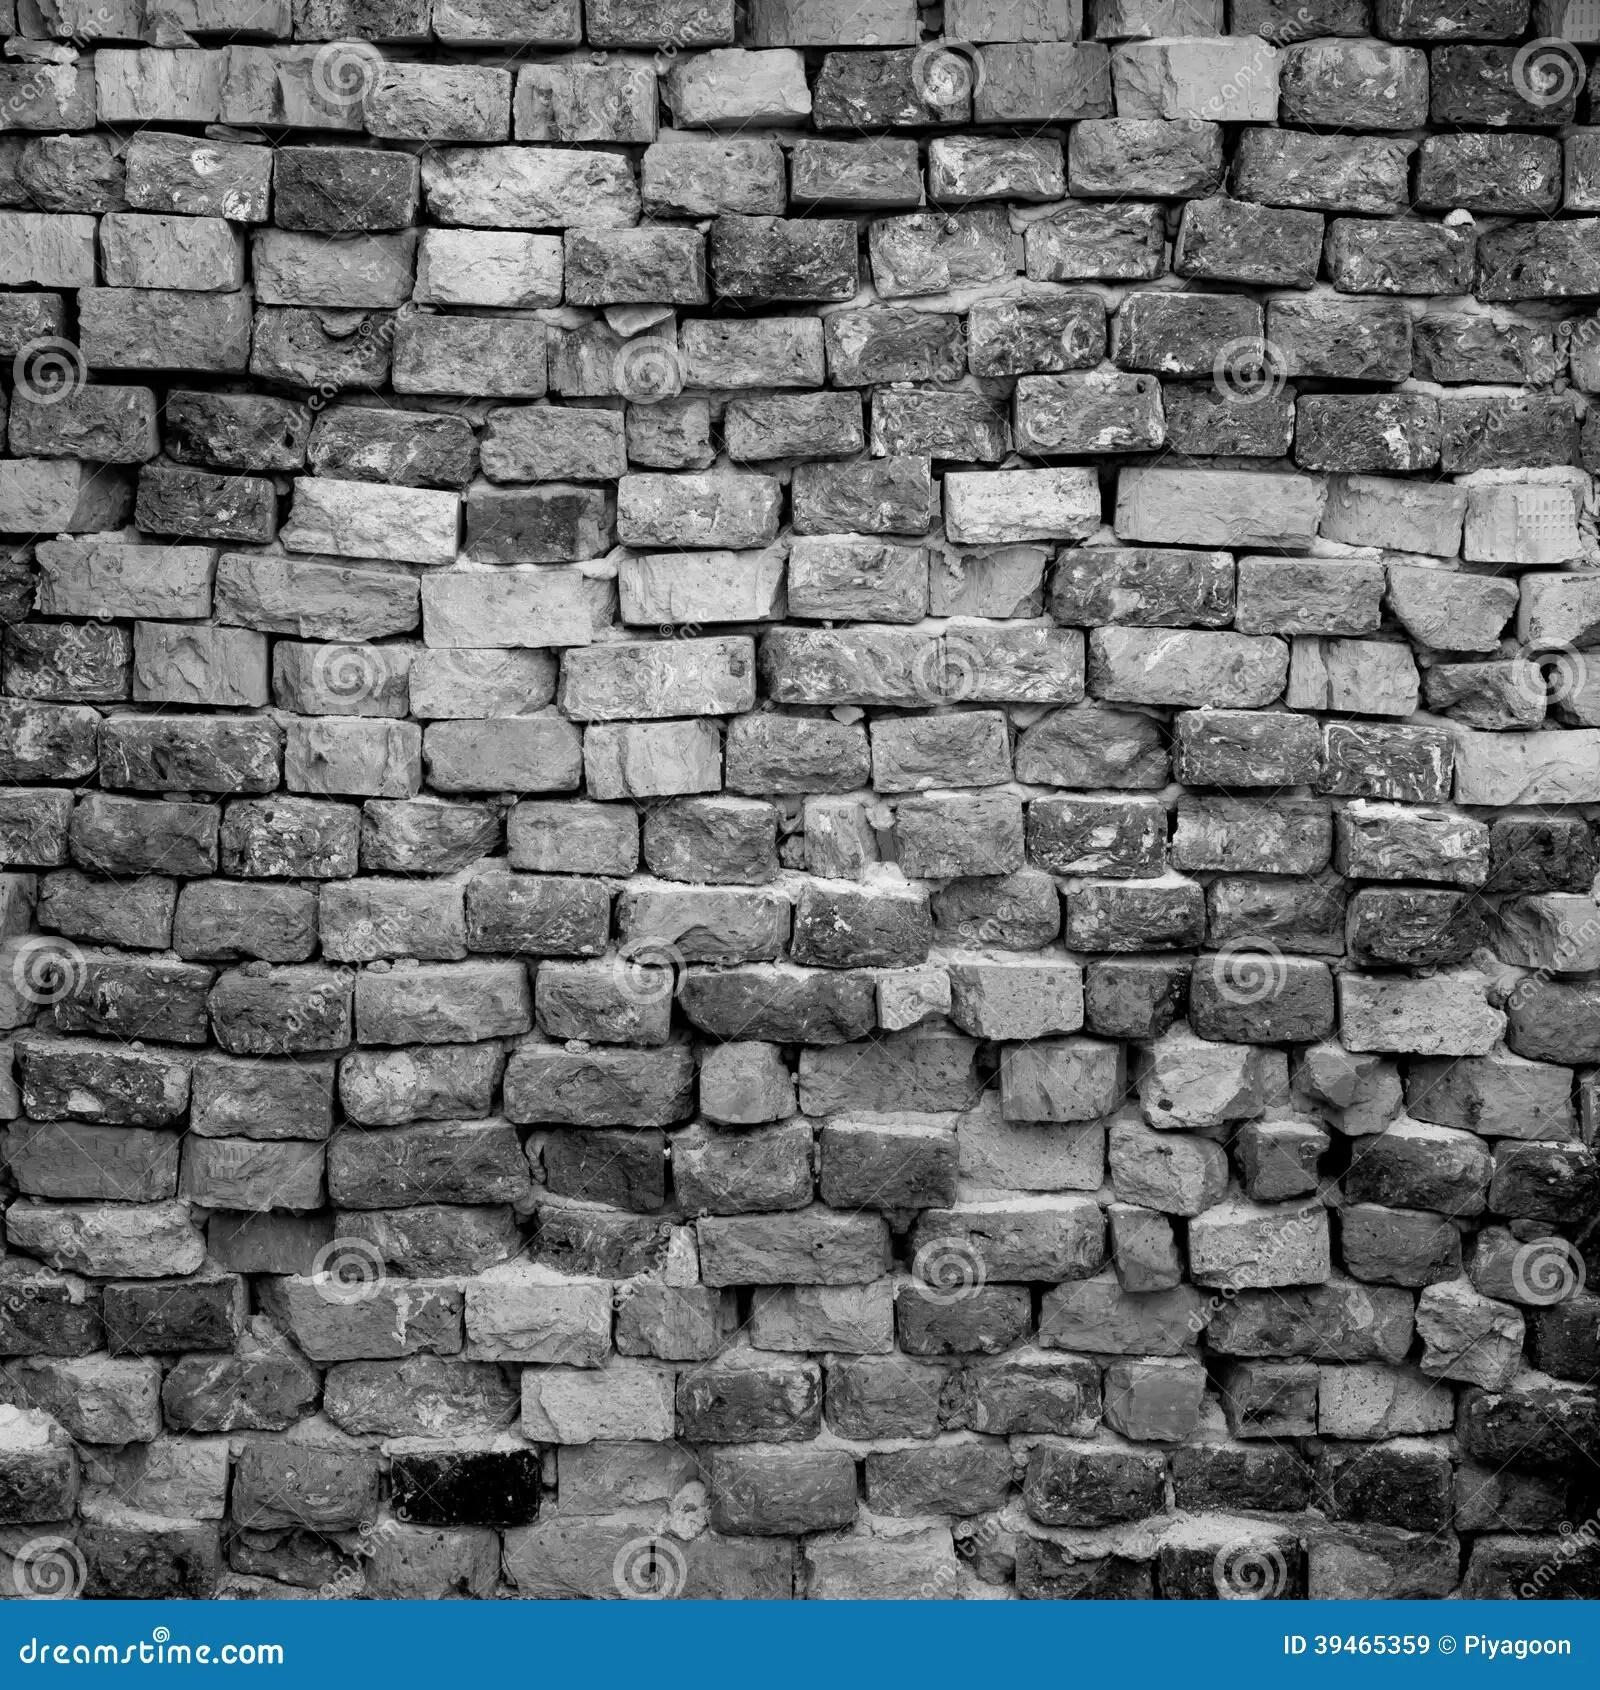 Black and white brick wall stock image. Image of brick